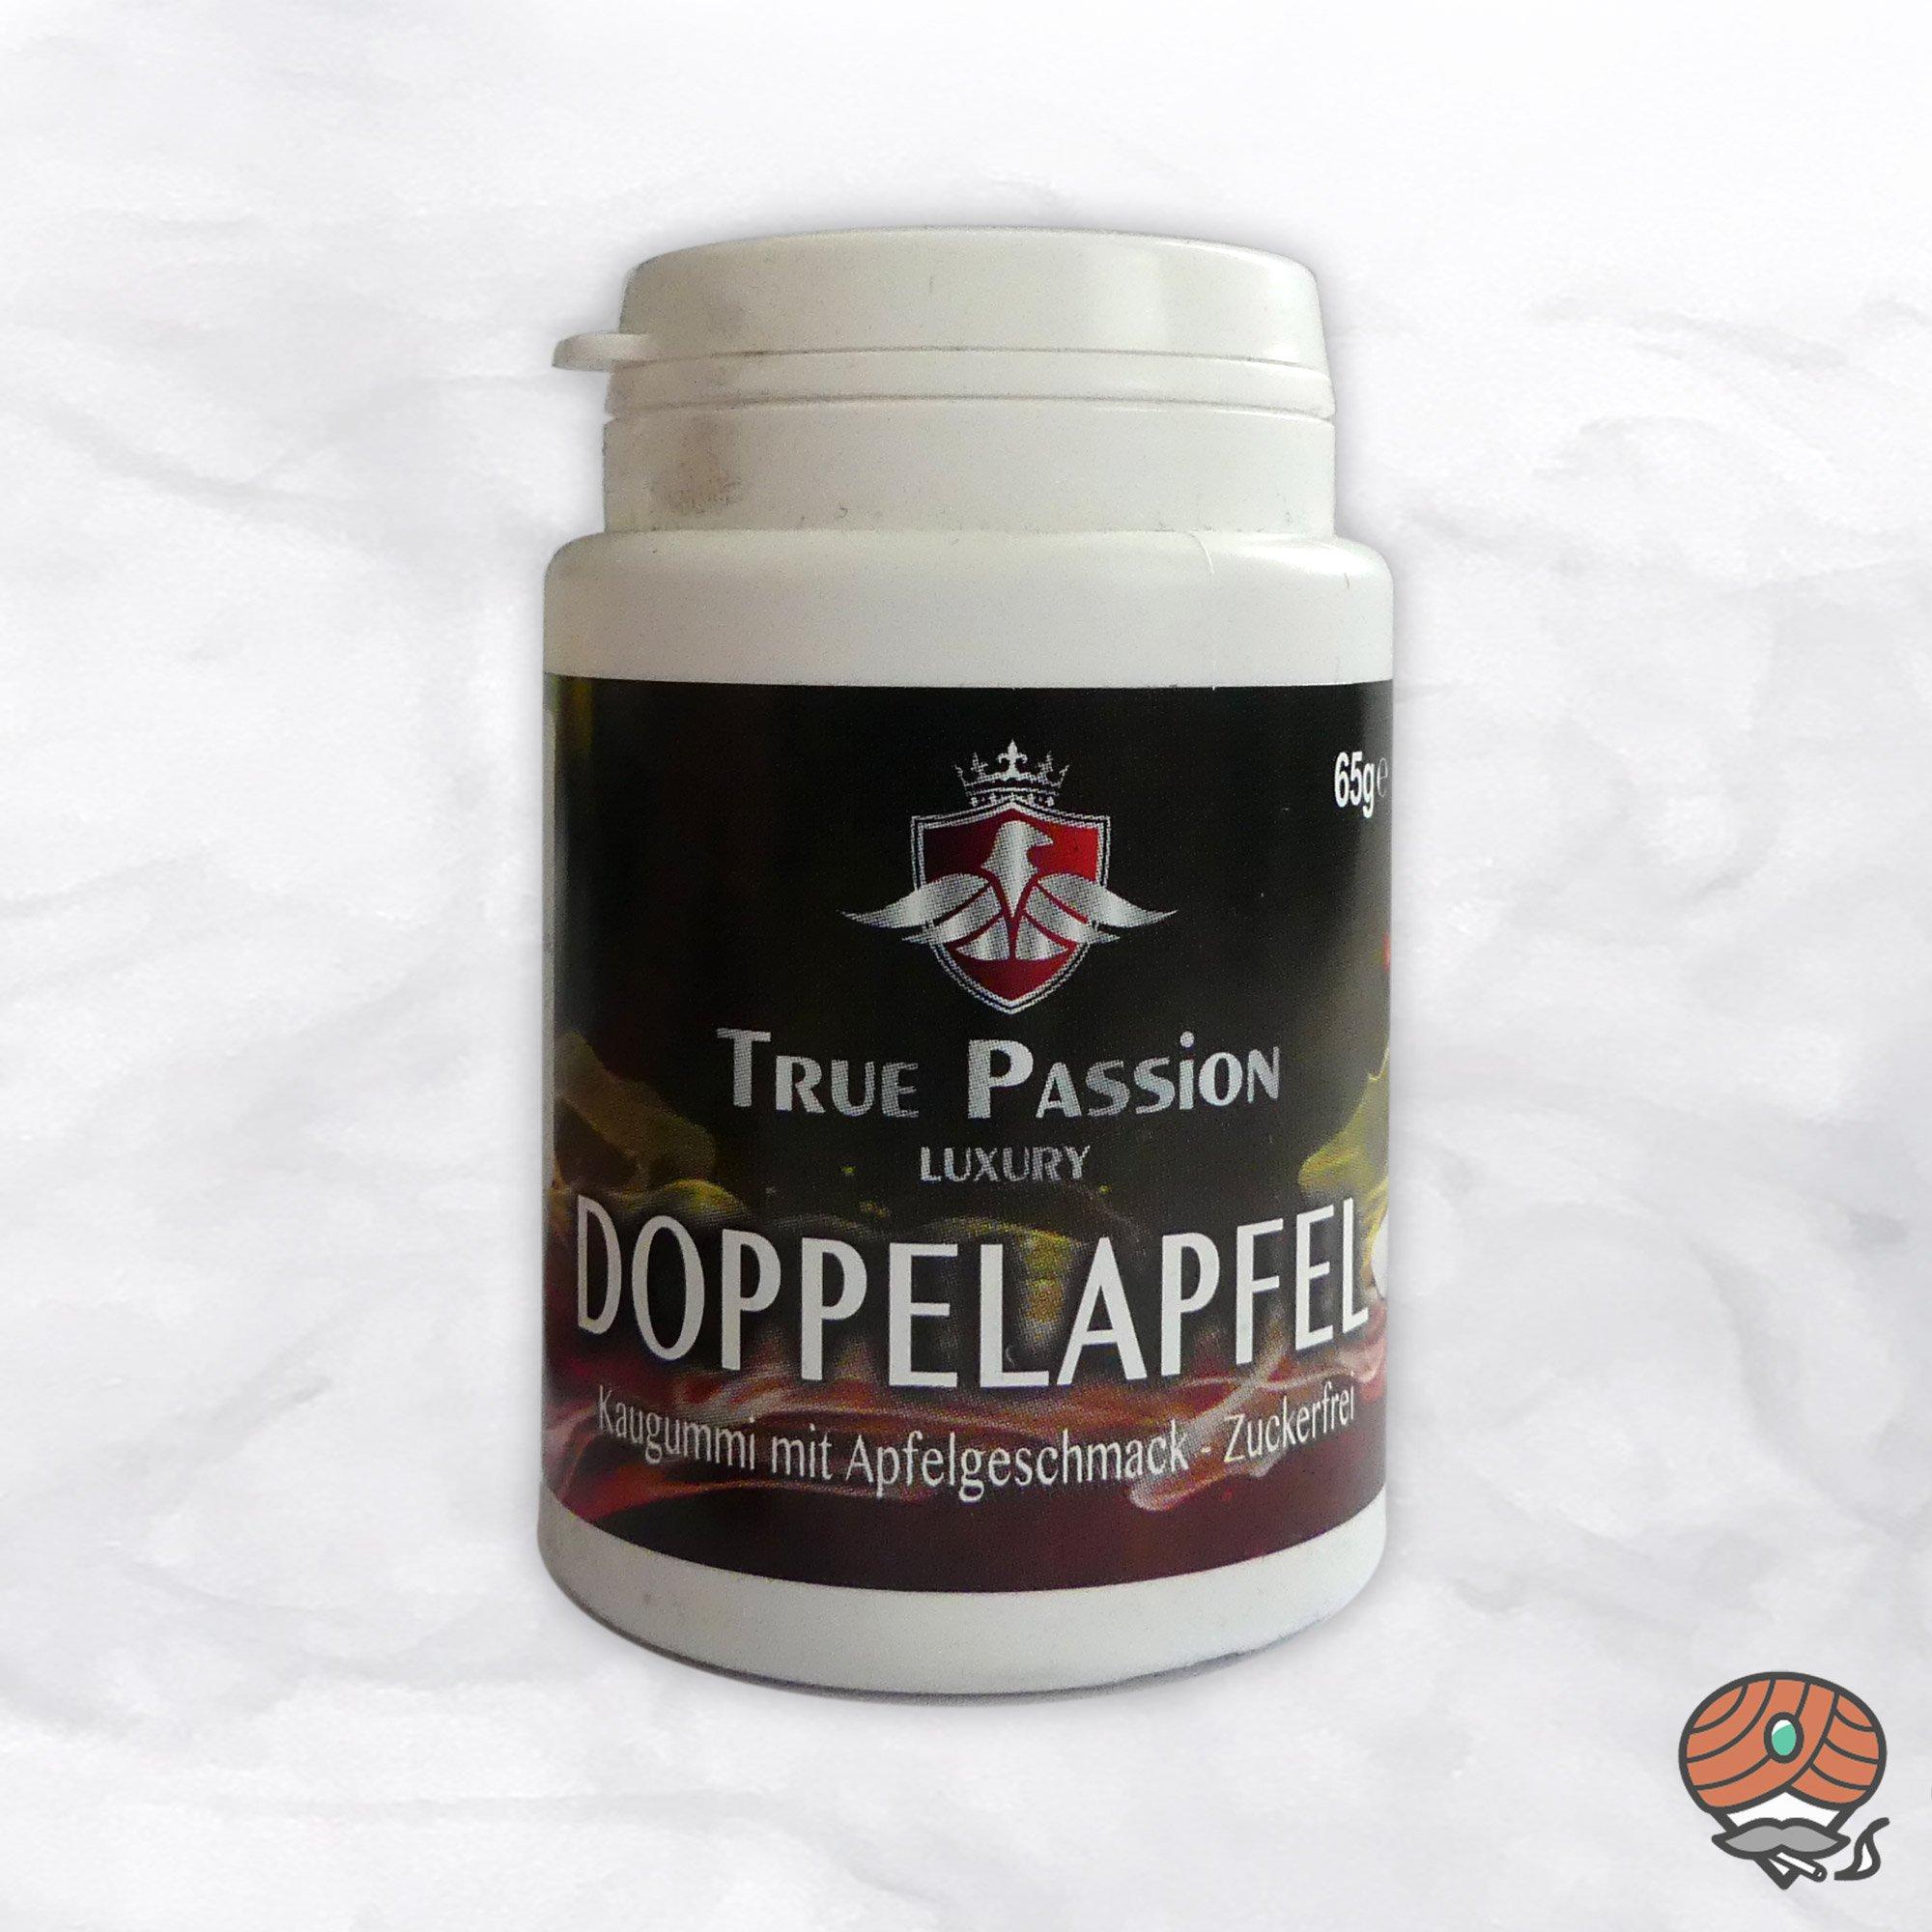 True Passion DOPPELAPFEL Kaugummi, zuckerfrei, 65 g